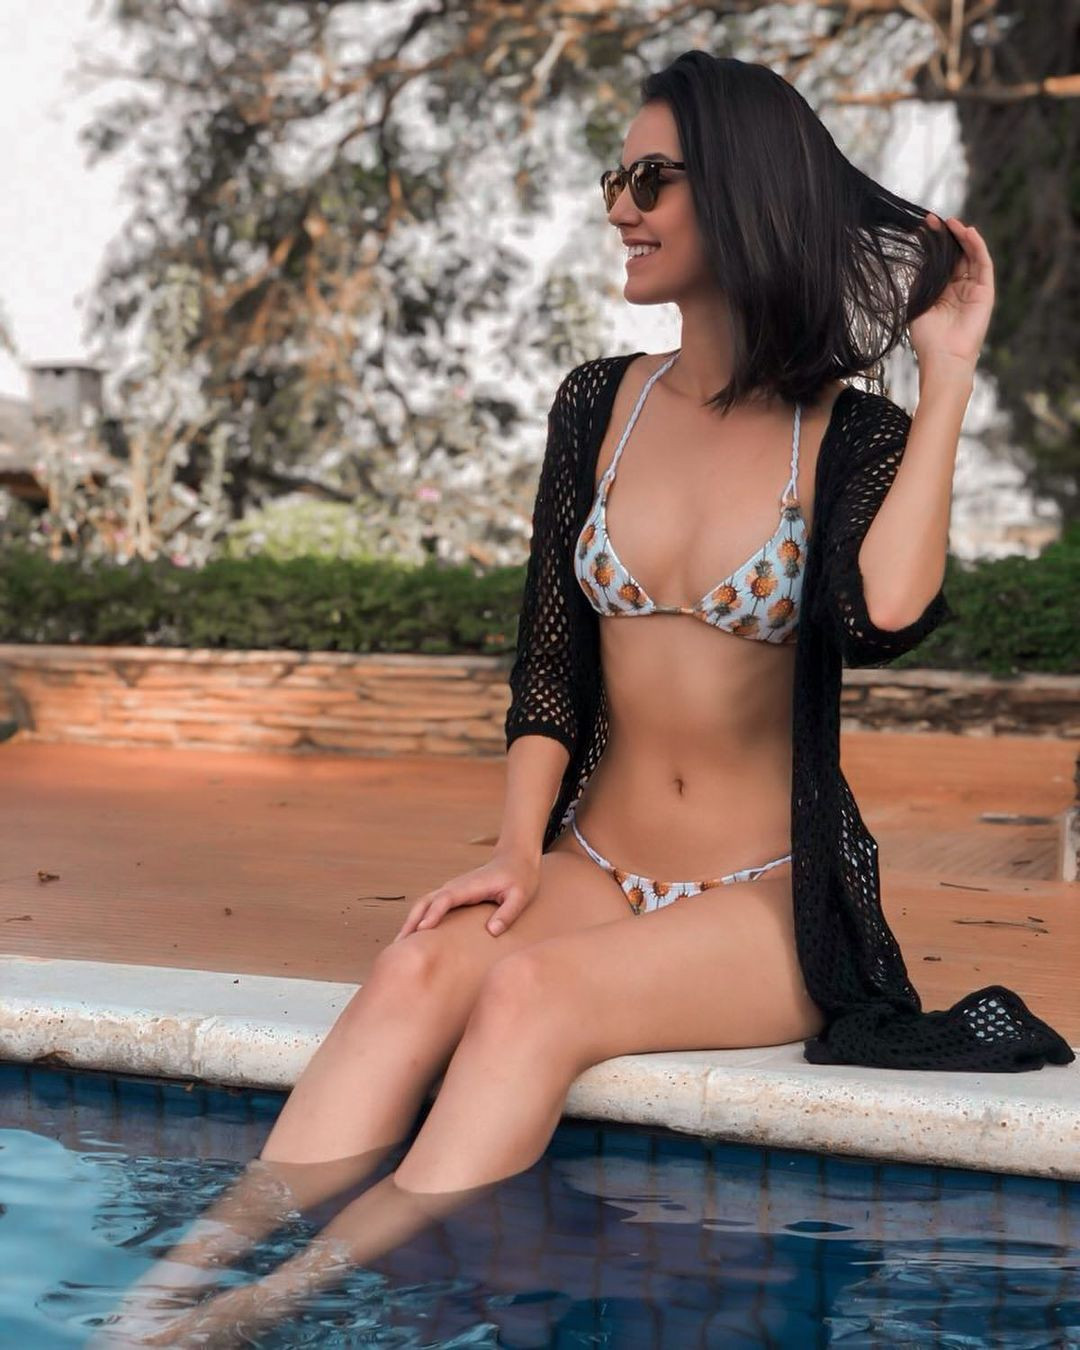 rafaella felipe, top 20 de miss brasil mundo 2019. - Página 4 Qtdvvf10